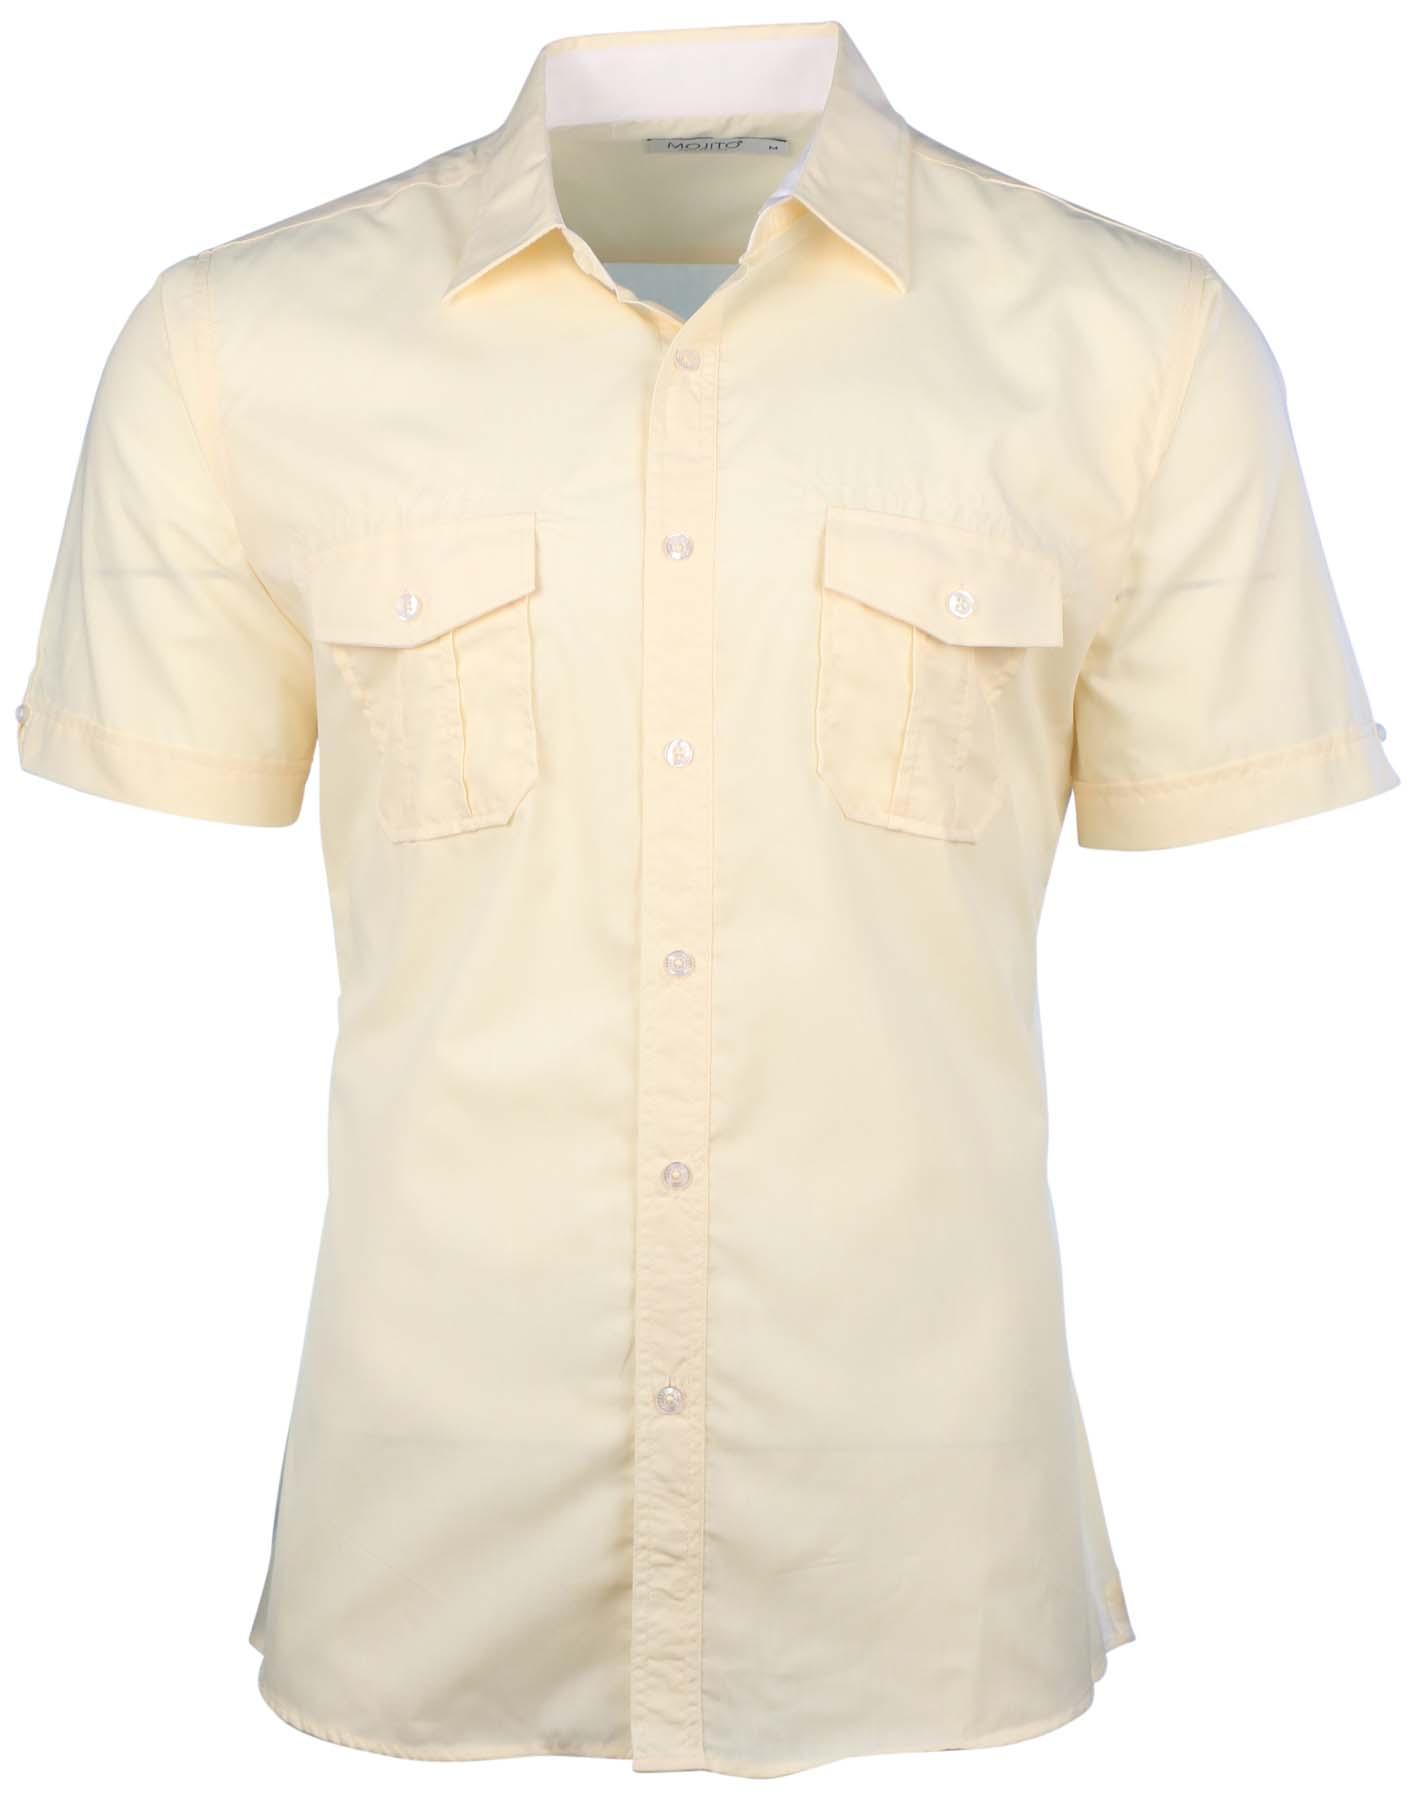 Mojito Collection Men's 2-Pocket Short Sleeve Button Down ...